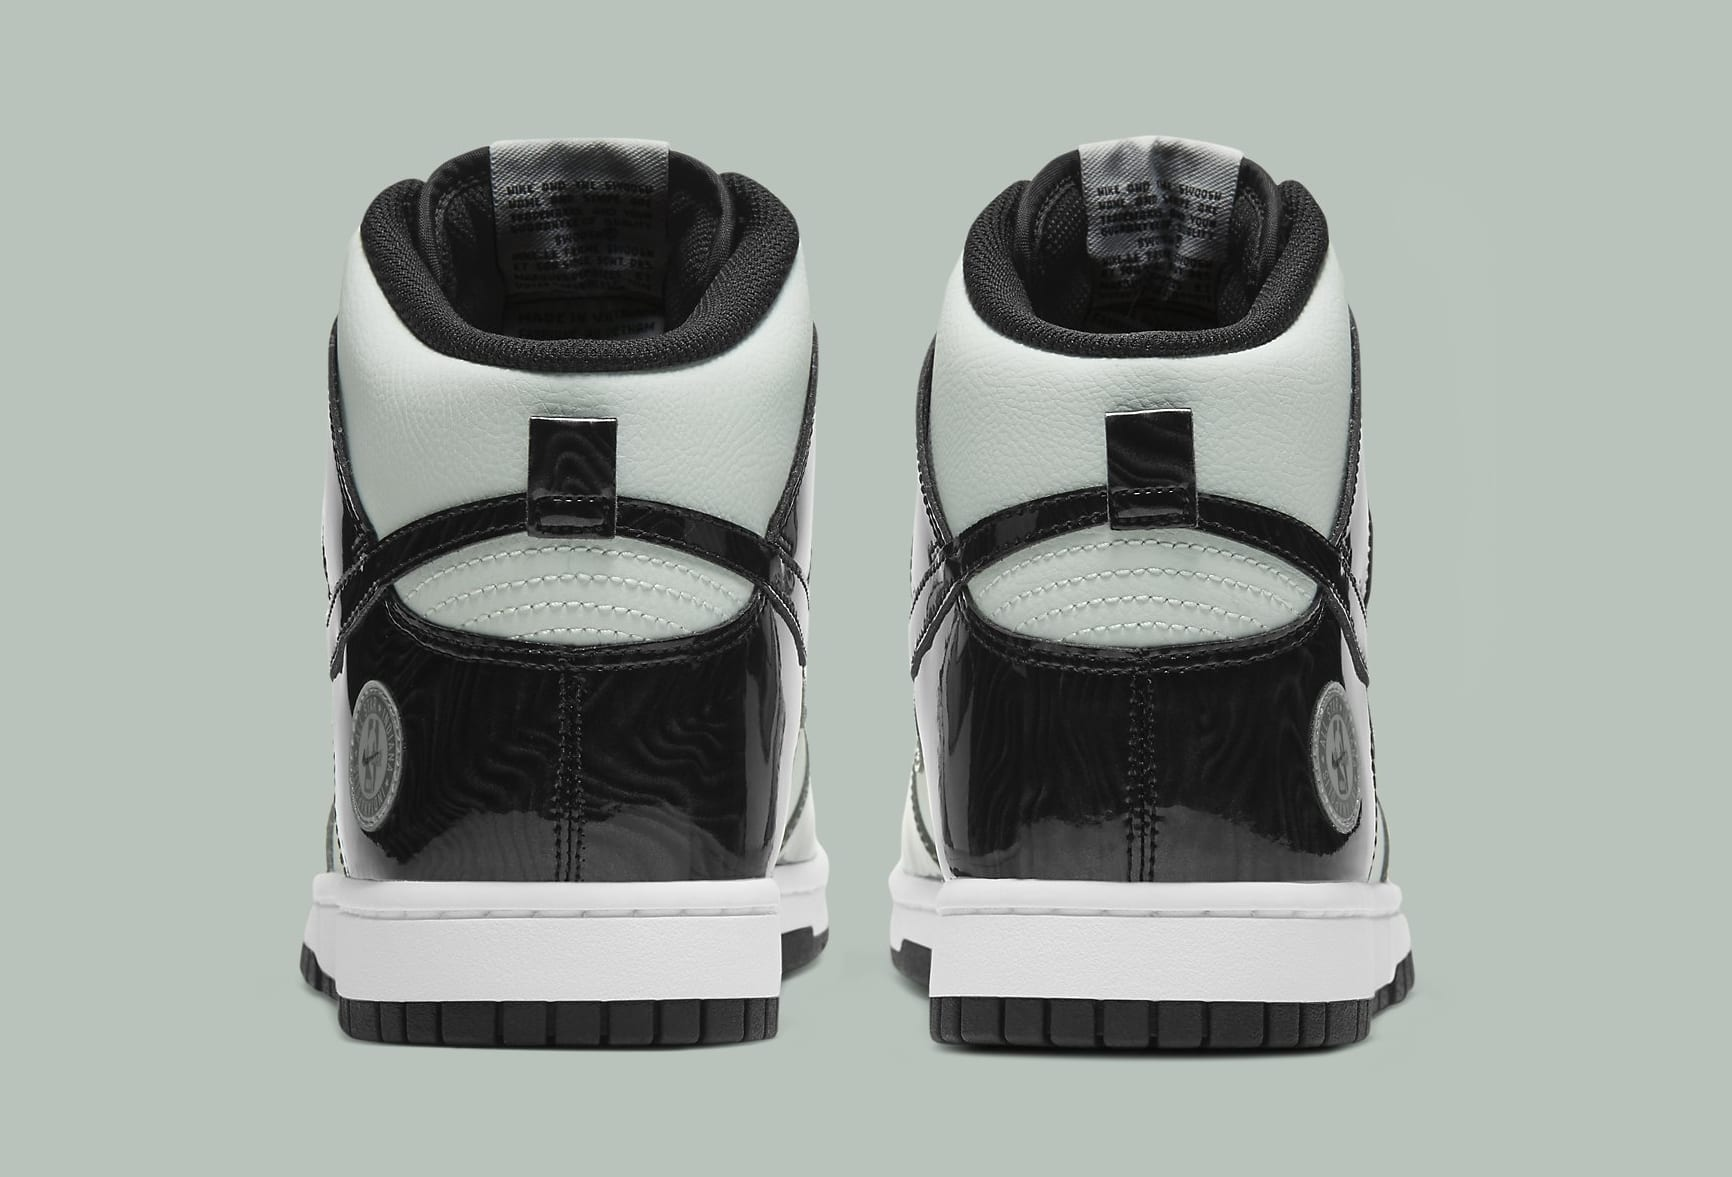 Nike Dunk High 'Barely Green' DD1398-300 Heel